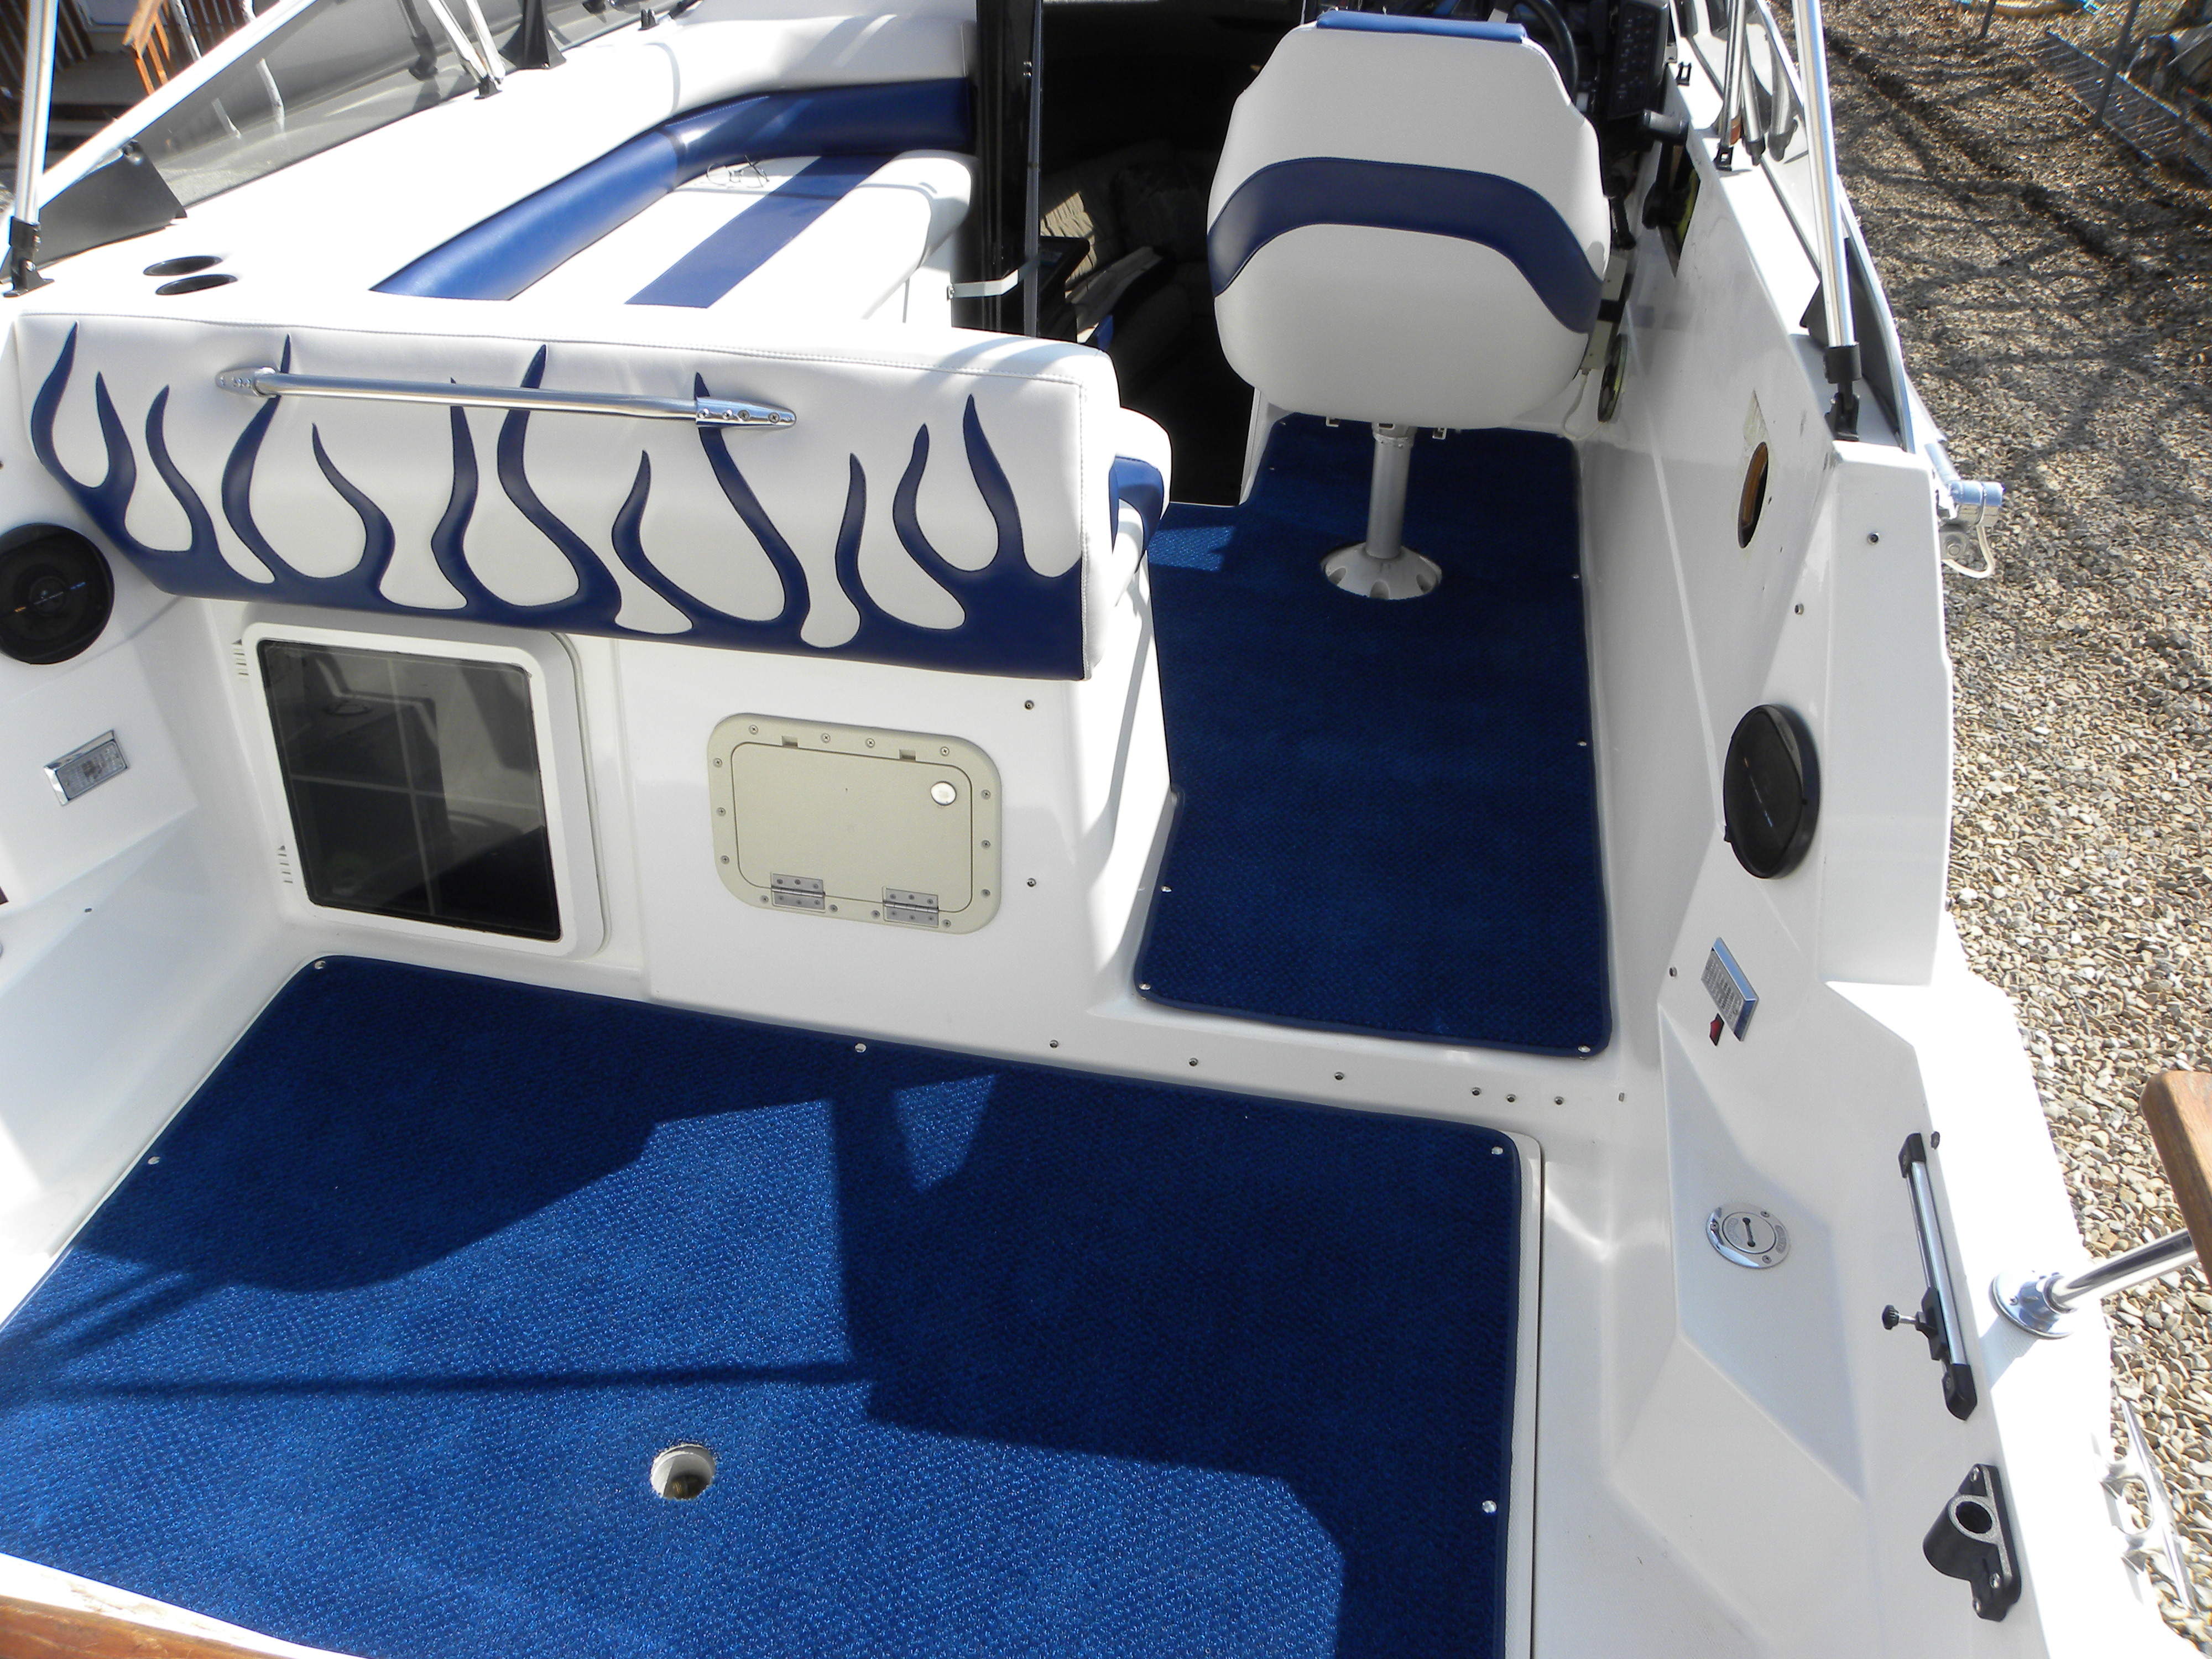 Boat seats sun decks travel + storage